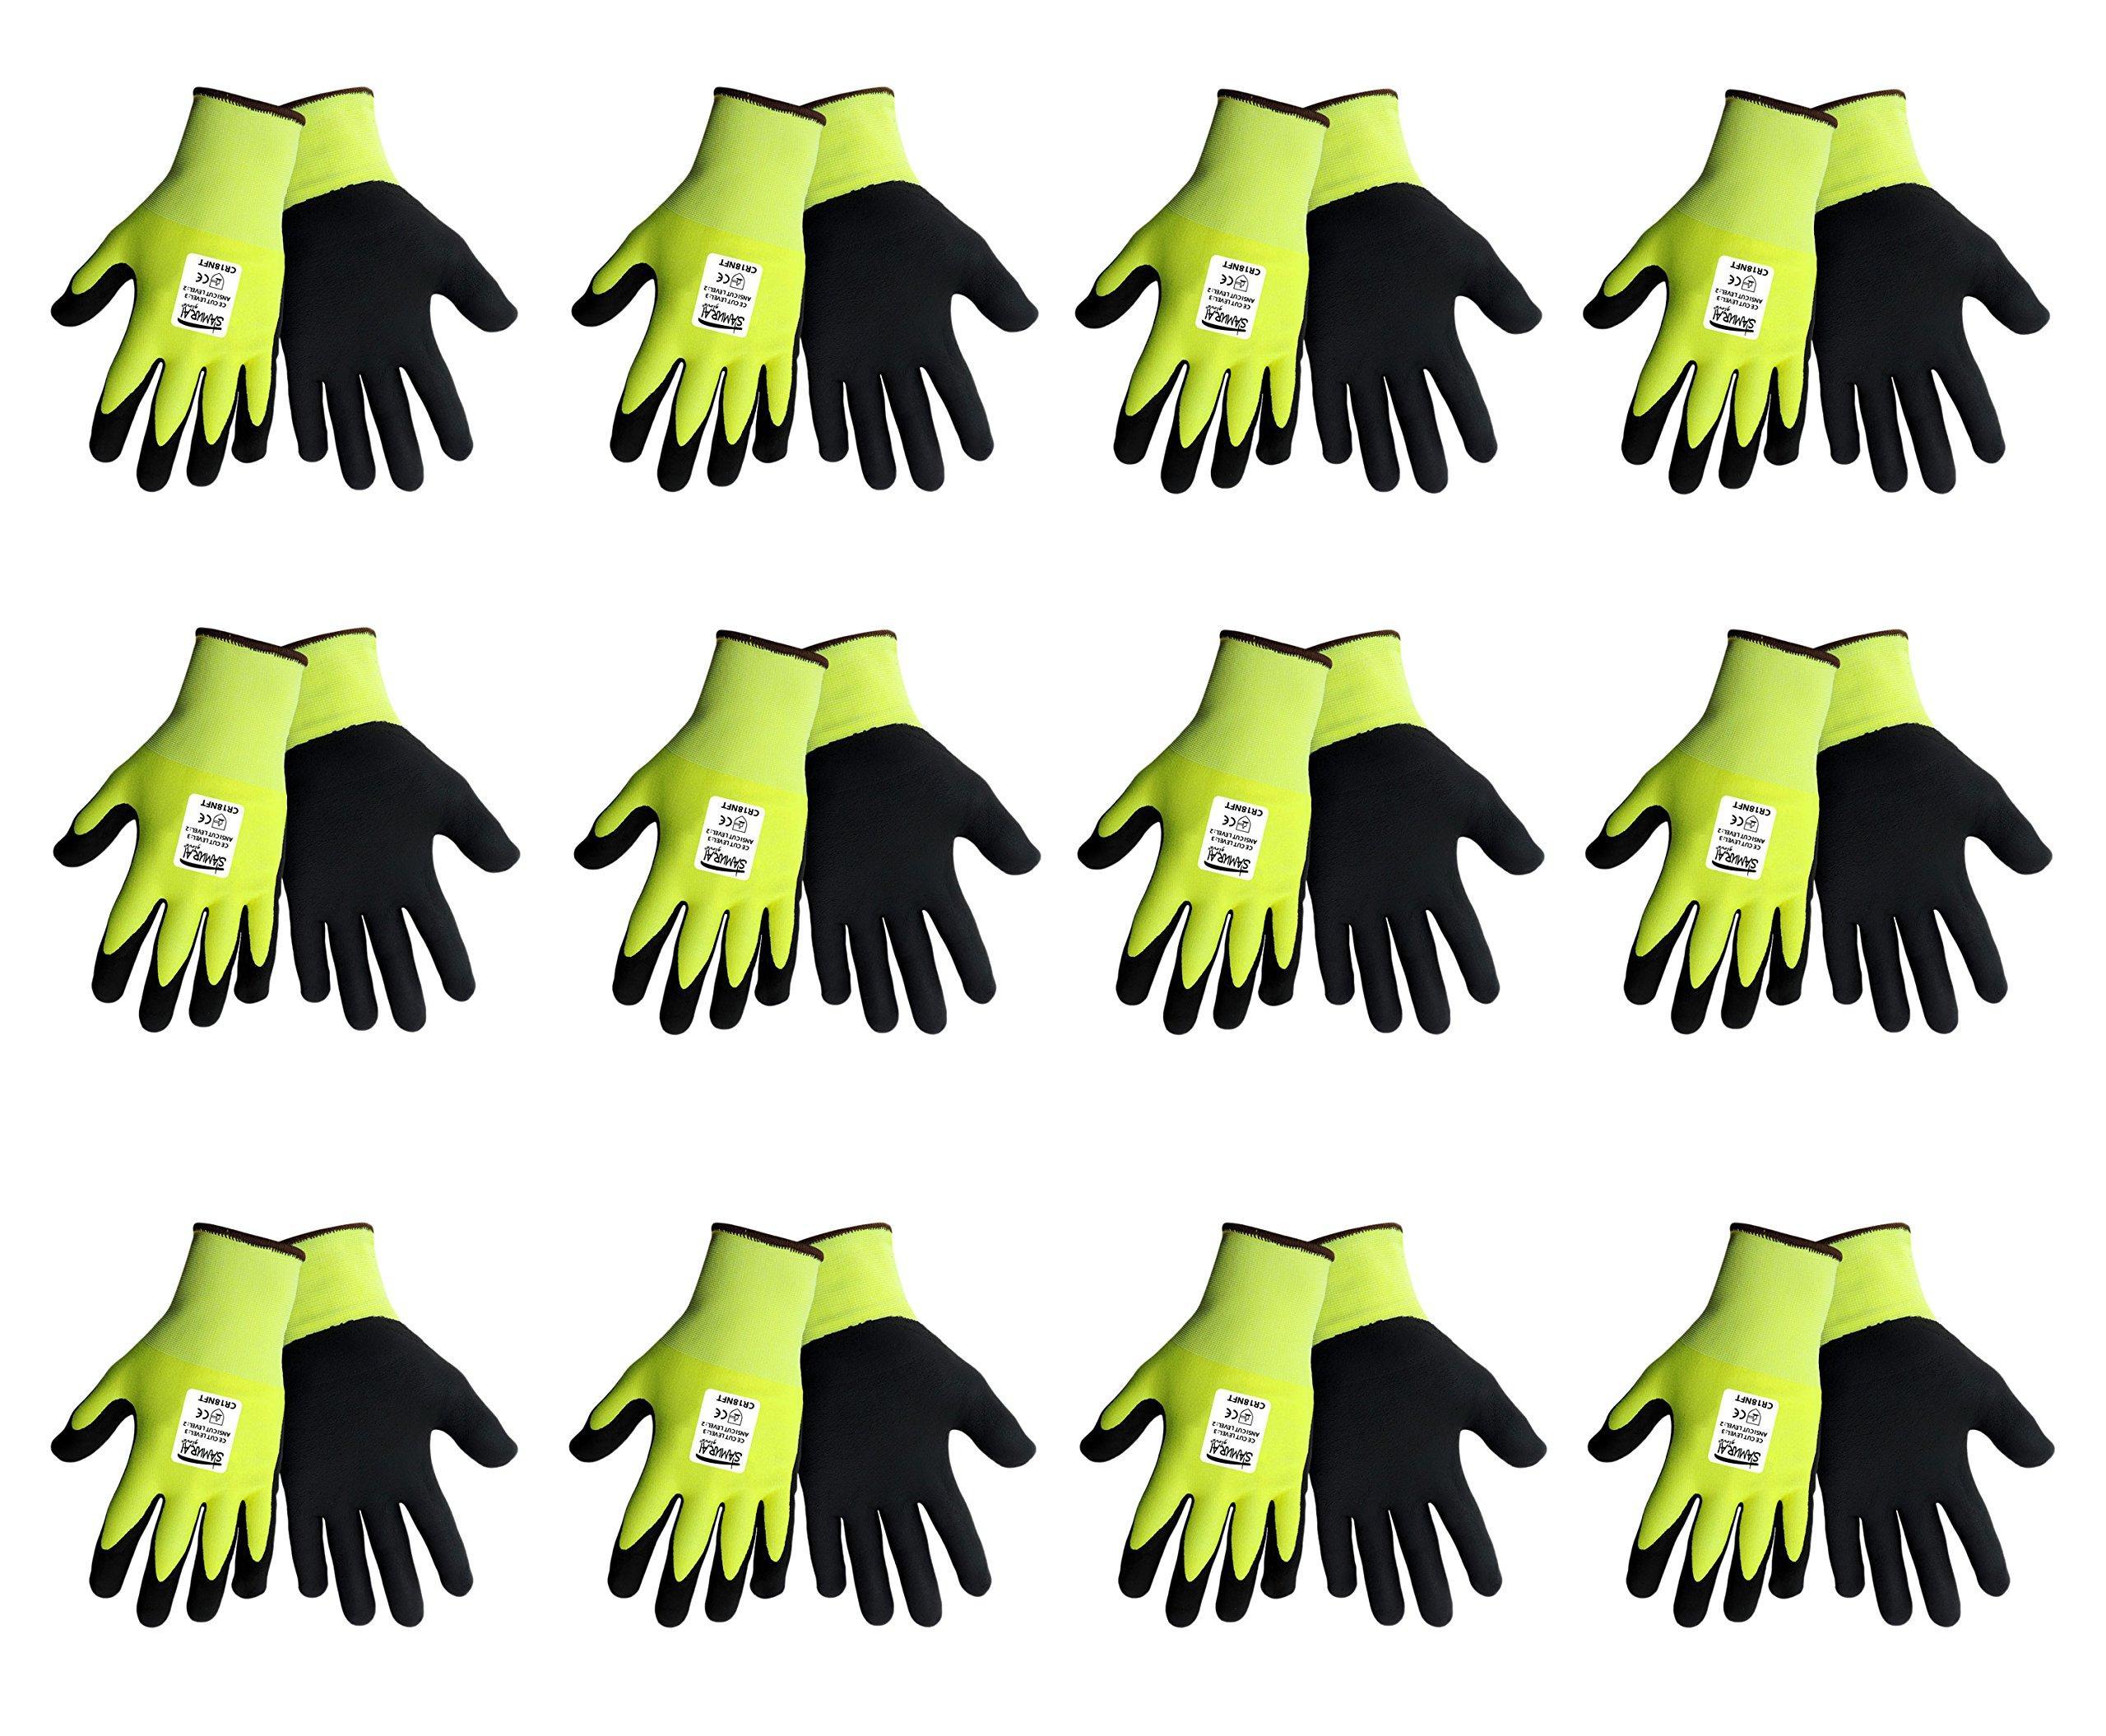 Samurai CR18NFT Hi-Vis Cut Resistant Nitrile Grip Glove, ANSI Cut Level 2, (12 Pair Pack) (Extra Large)